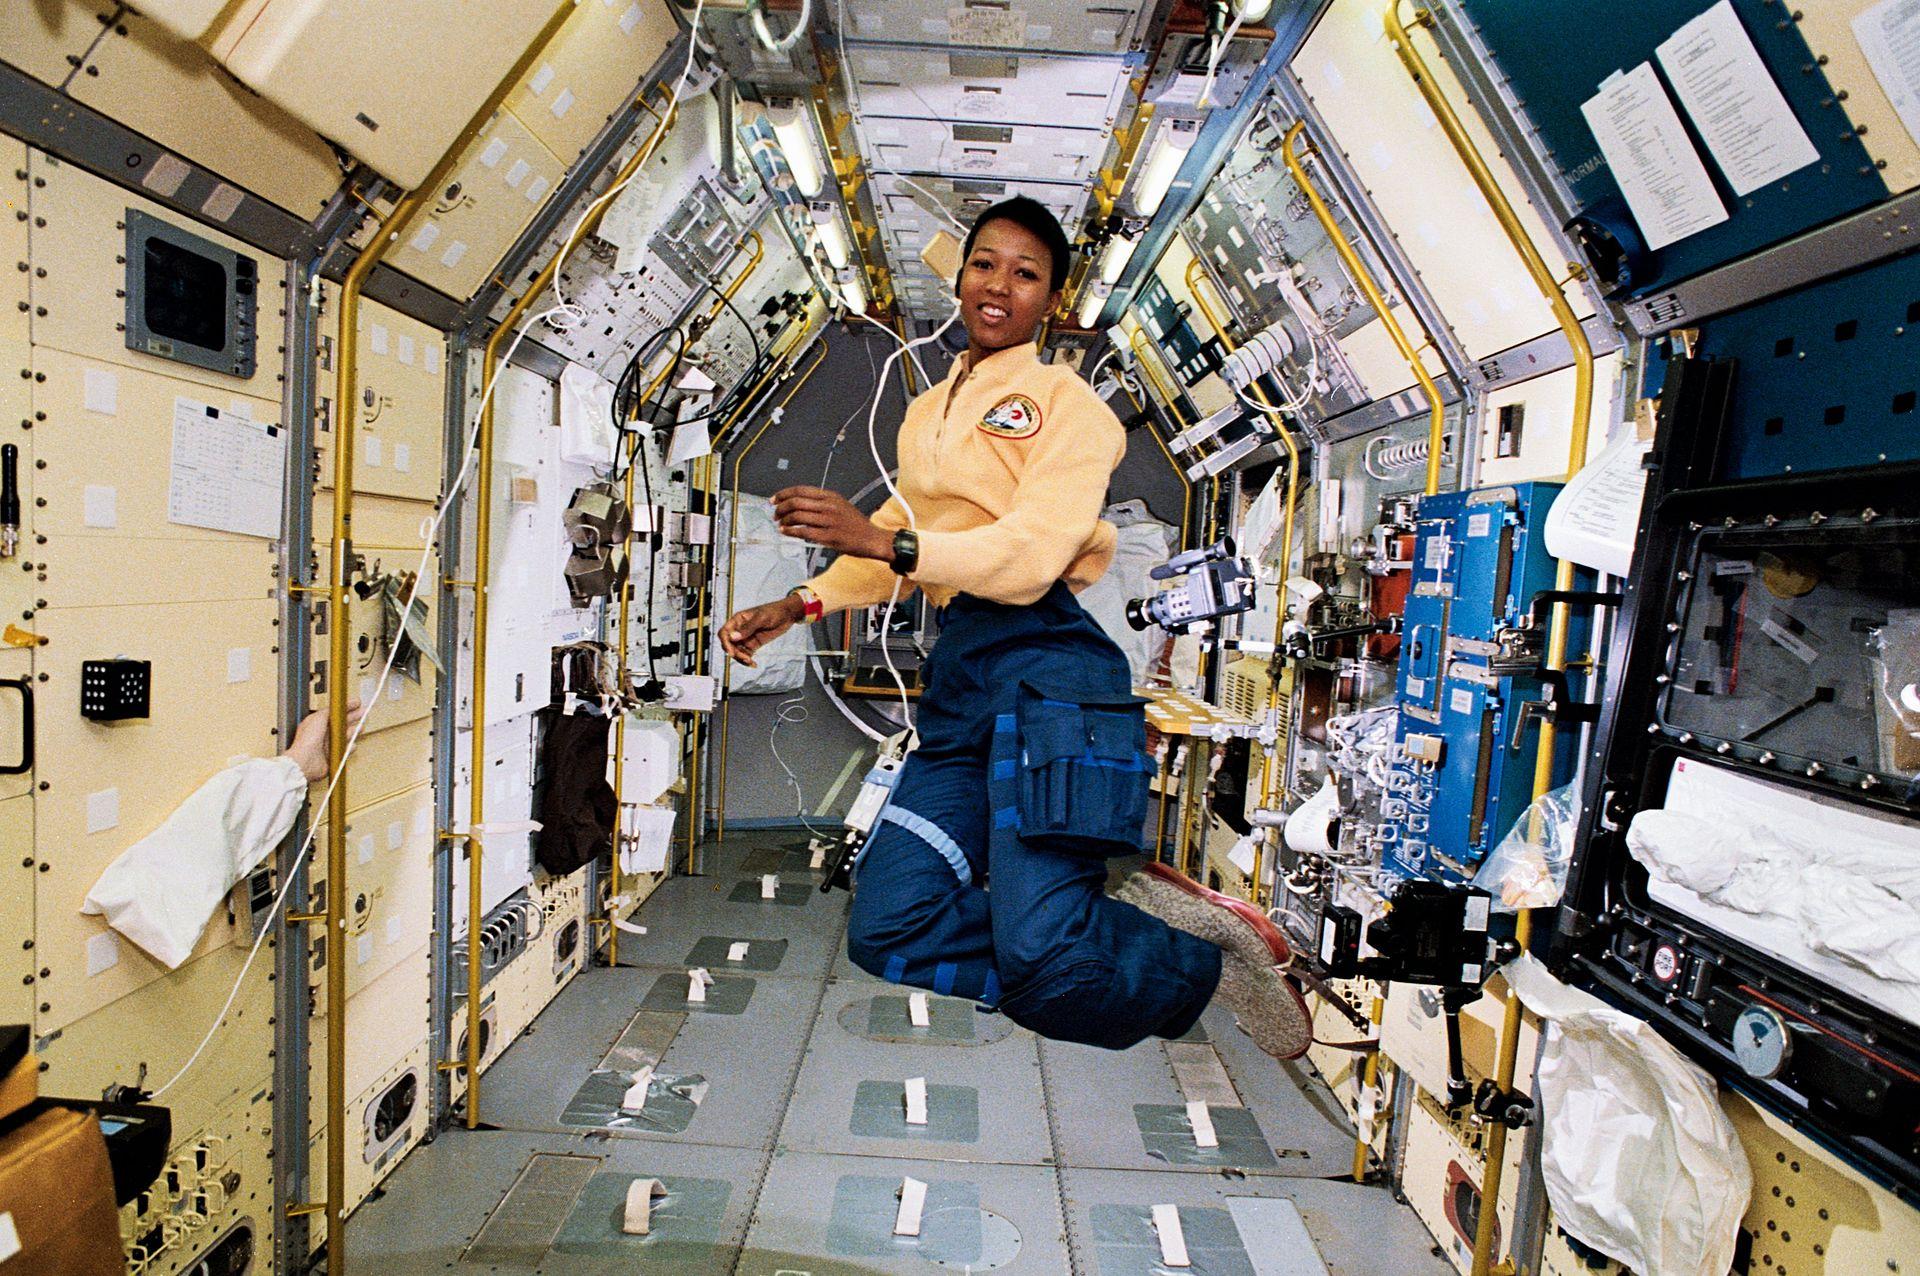 astronaut corps - photo #41